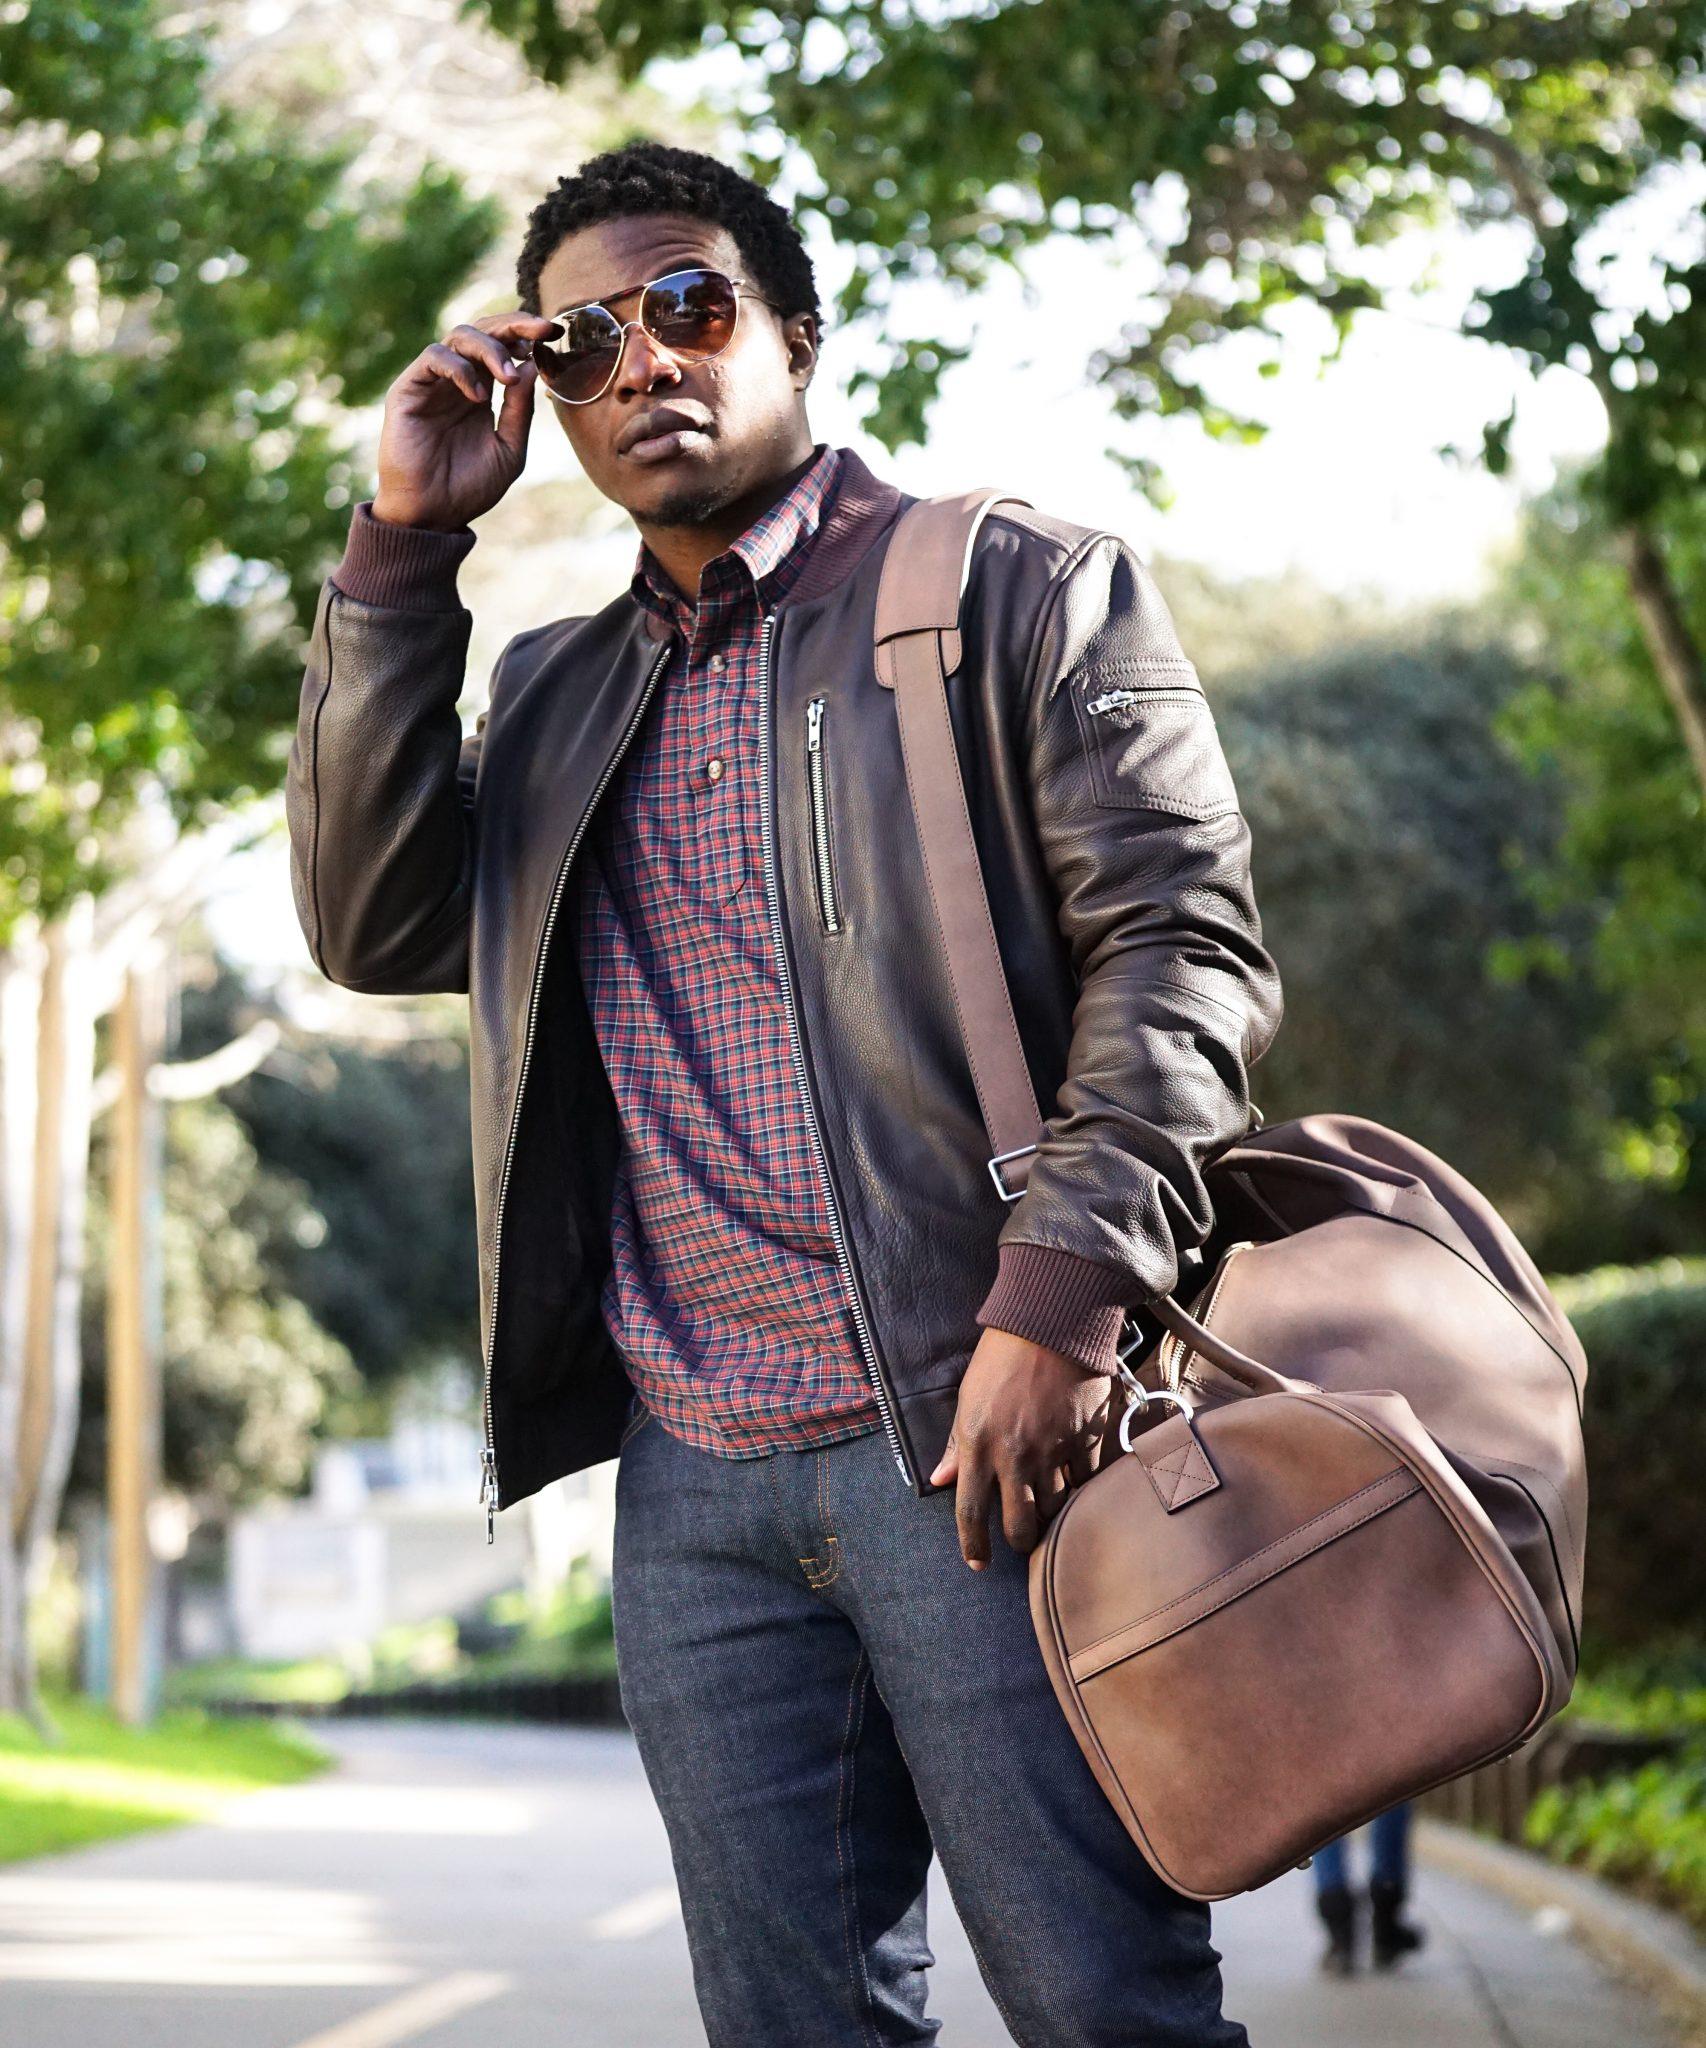 dapper-advisor-black-man-wearing-brown-leather-bomber-jacket-holding-brown-leather duffle bag-1